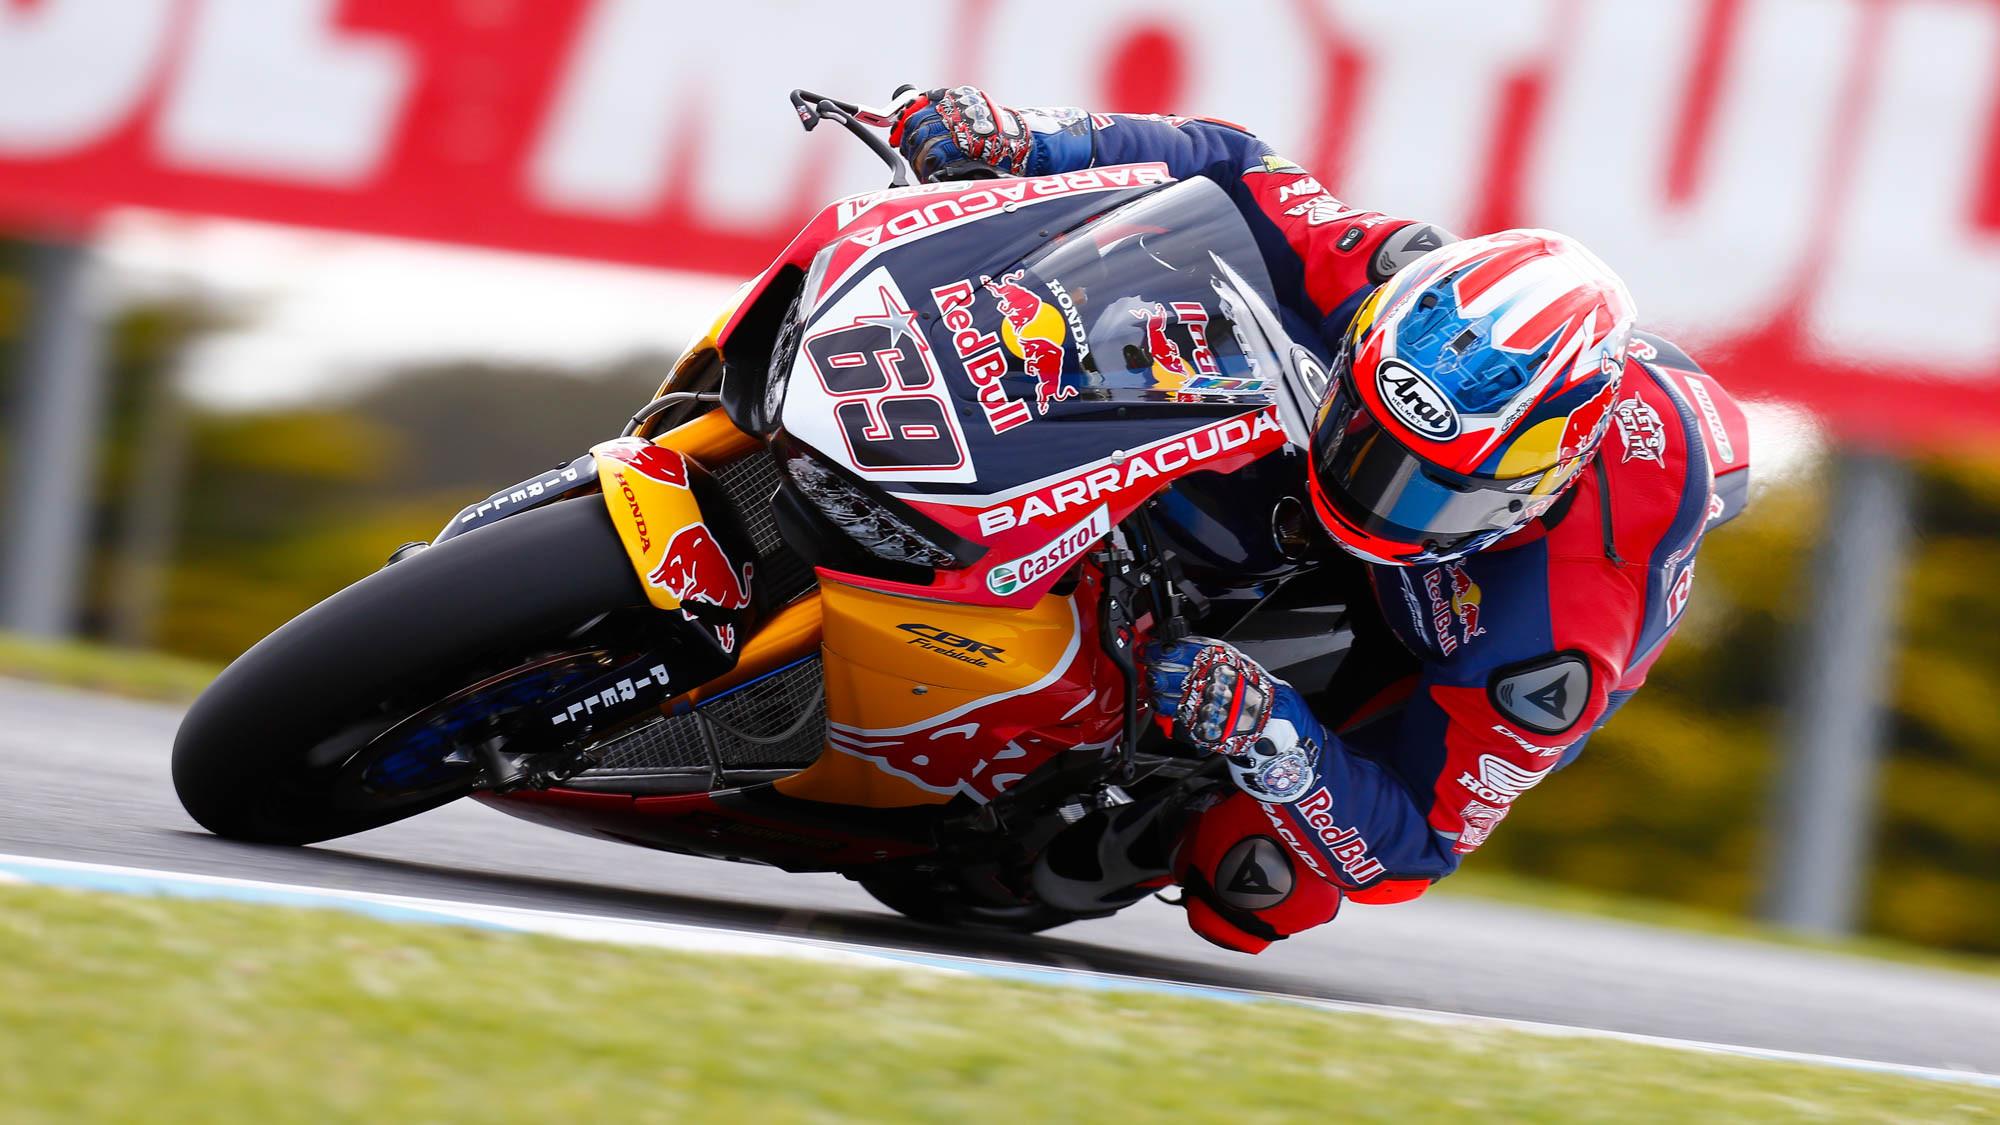 World Superbike Wallpaper (73+ images)Honda Superbike 2013 Wallpaper